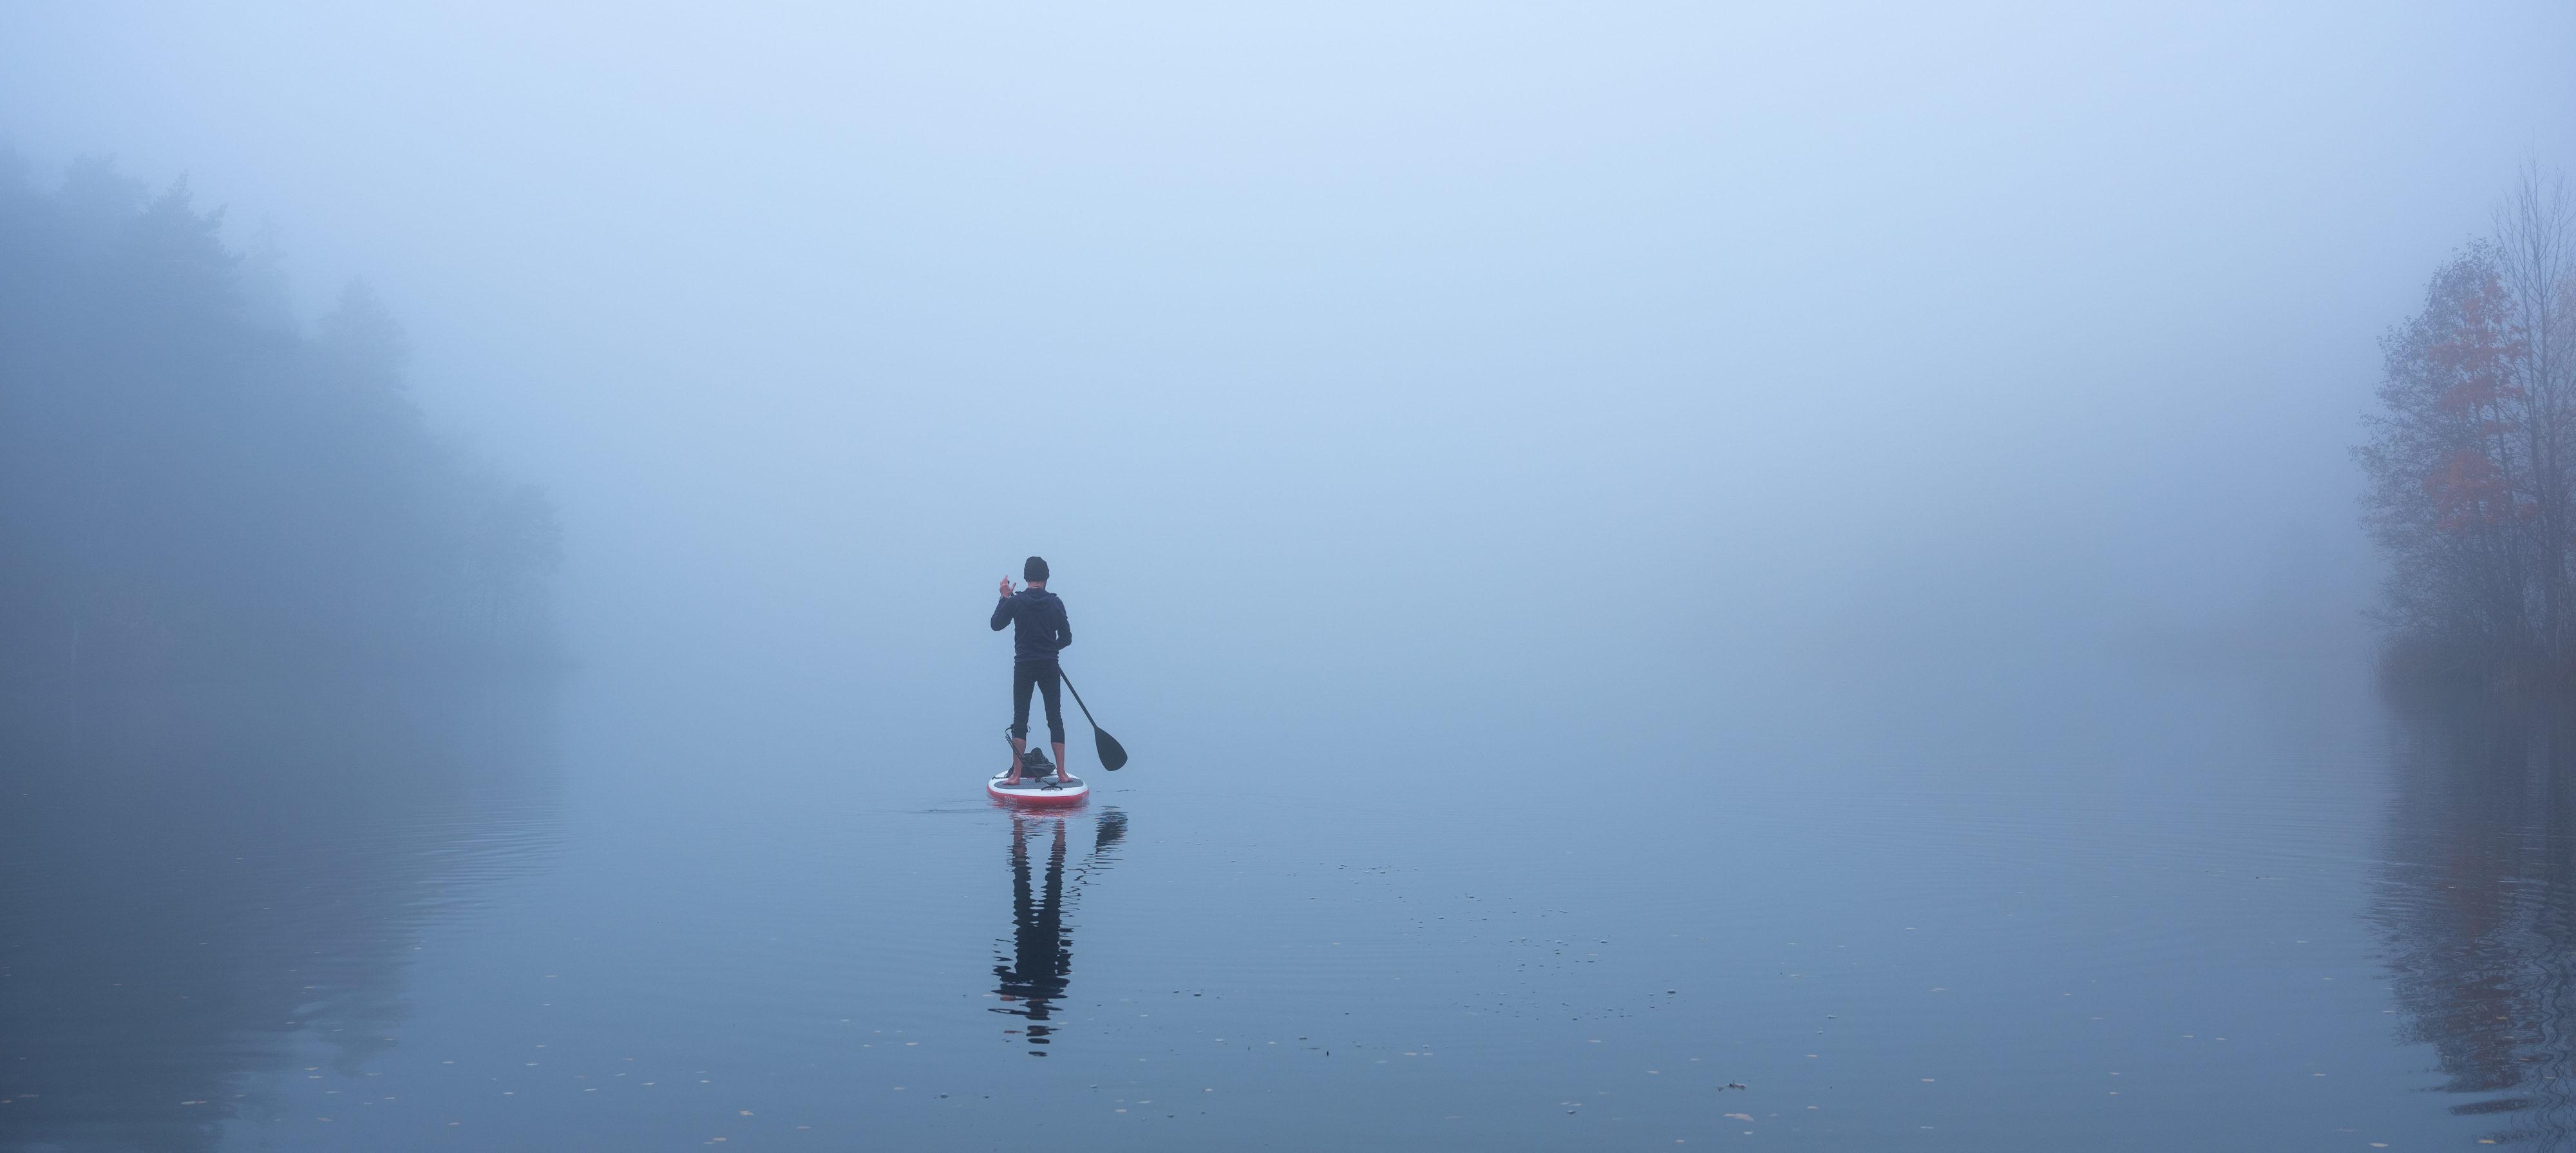 Roel van der Ven on a SUP board in the mist